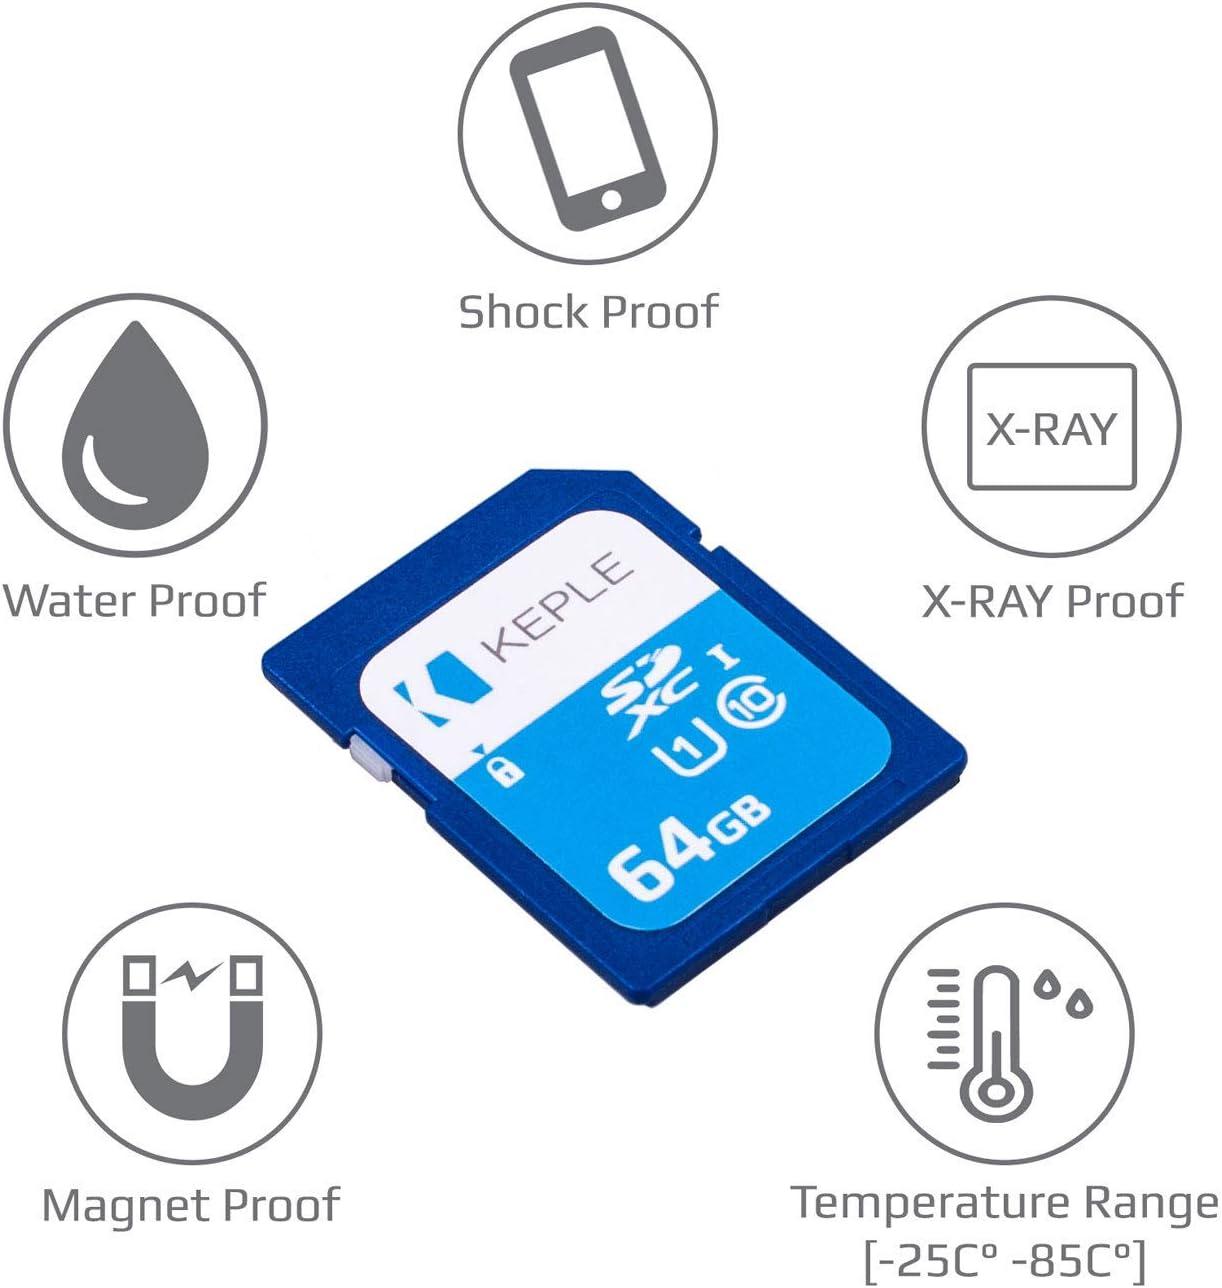 64GB SD Card Class 10 High Speed Memory Card Compatible with Panasonic Lumix DMC-FZ1000, DMC-FZ72, DMC-FZ330, DMC-FZ200, DMC-FH6, DMC-FH8, DMC-TZ70, DMC-TZ57, DMC-TZ40 Camera | UHS-1 U1 SDXC 64 GB